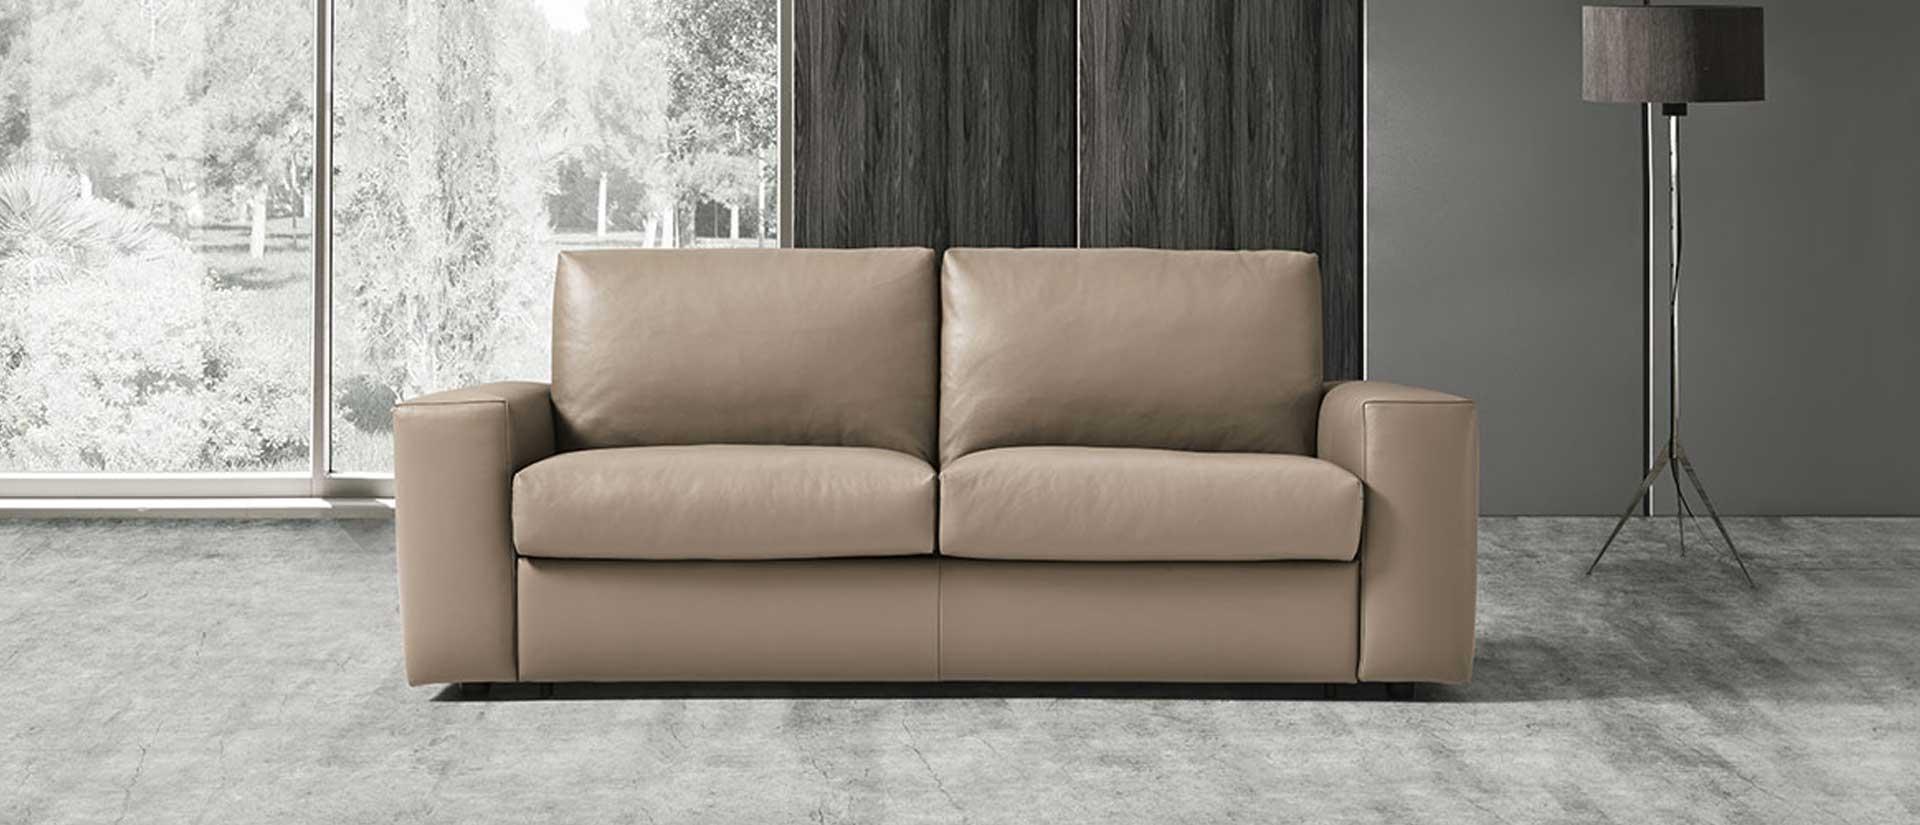 divano-stile-moderno-modello-miller